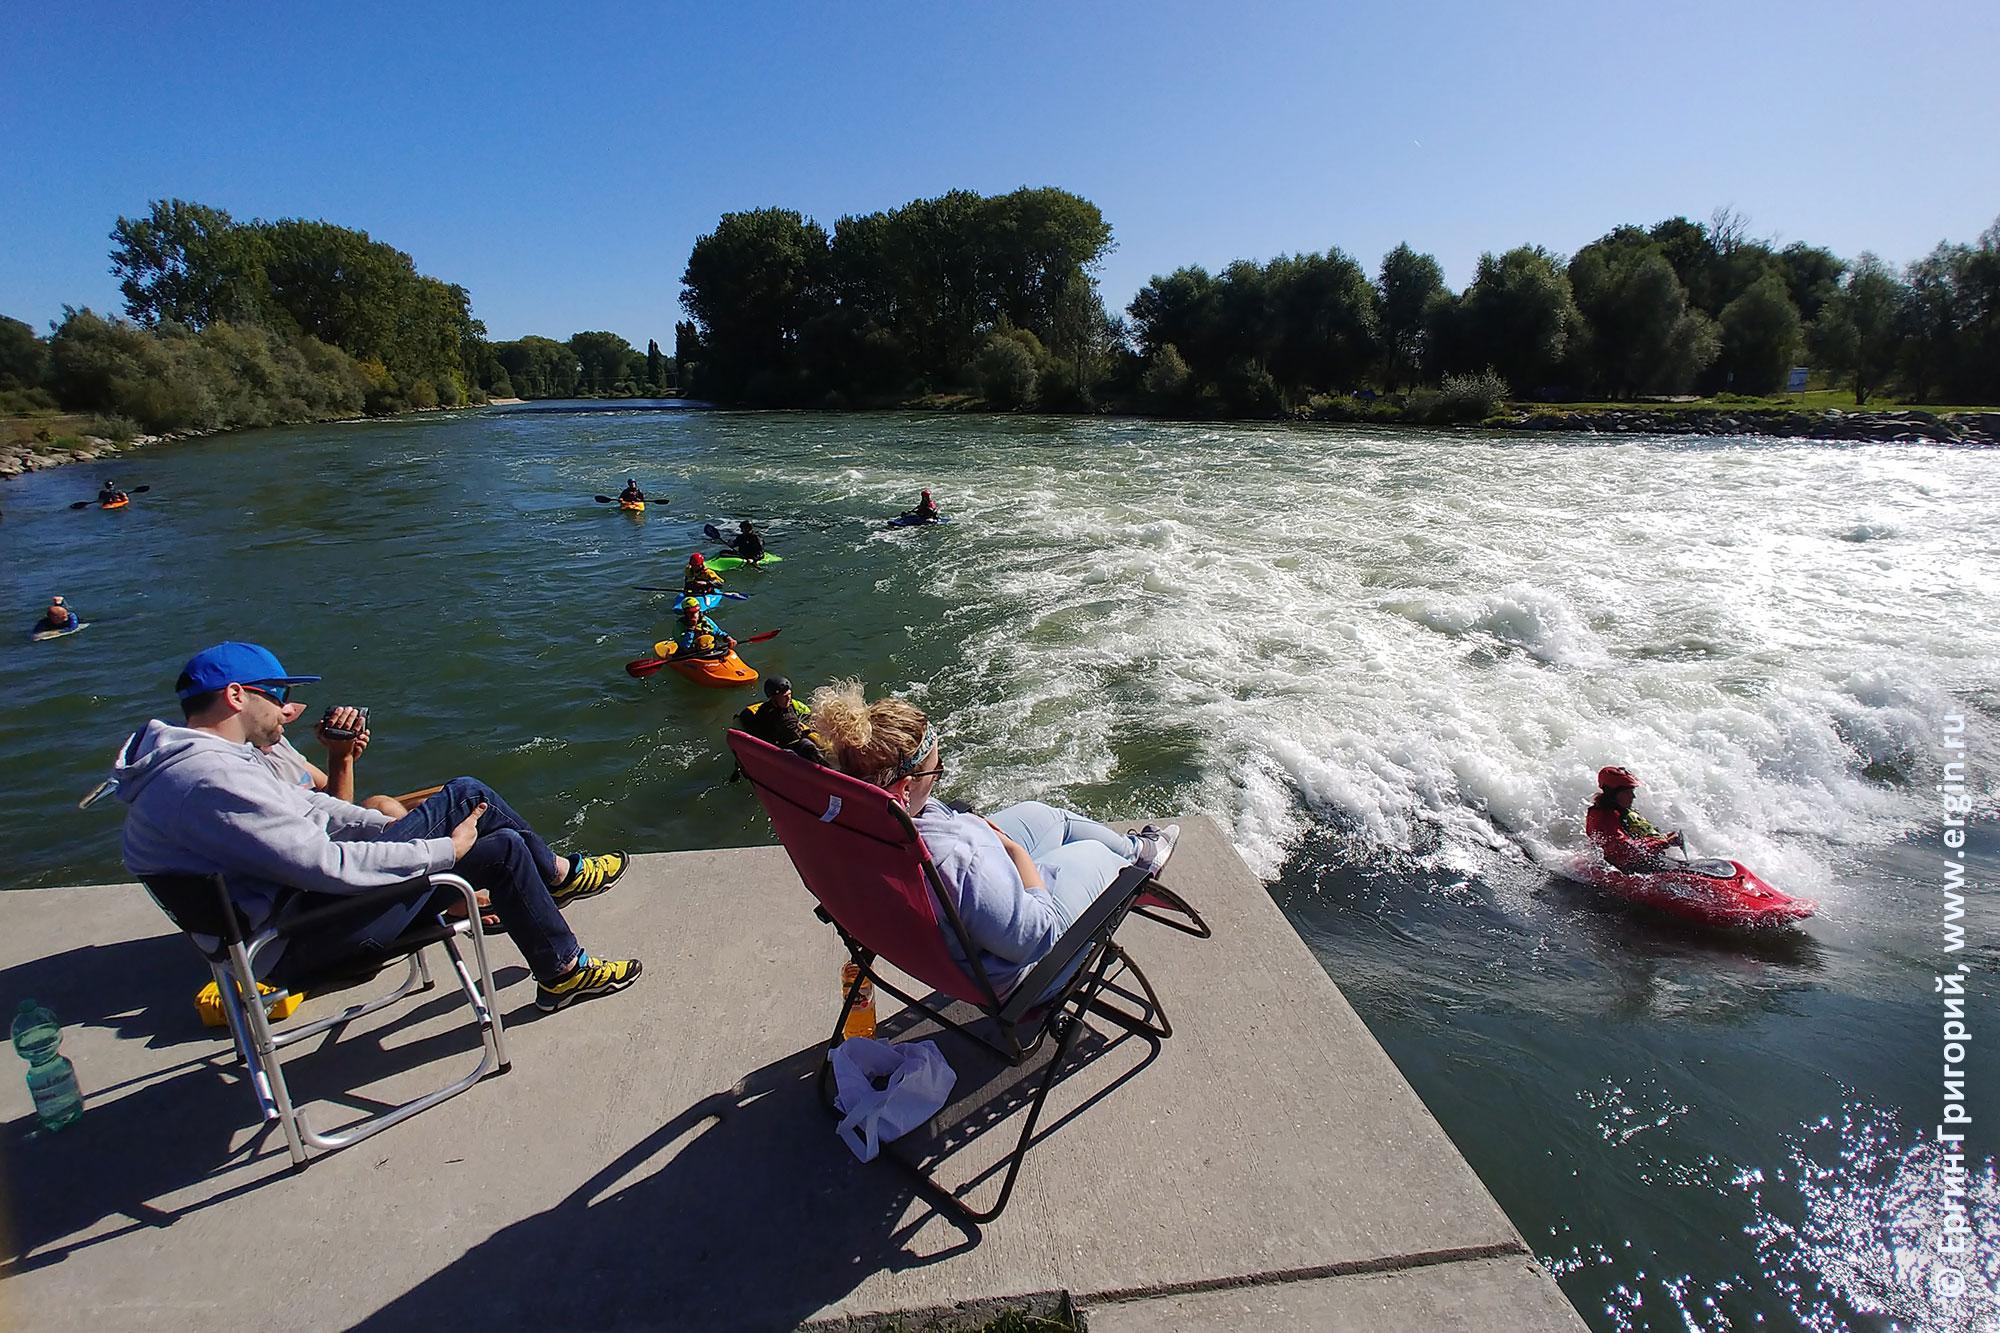 Платтлинг плейспот для фристайл-каякинга на реке Изар